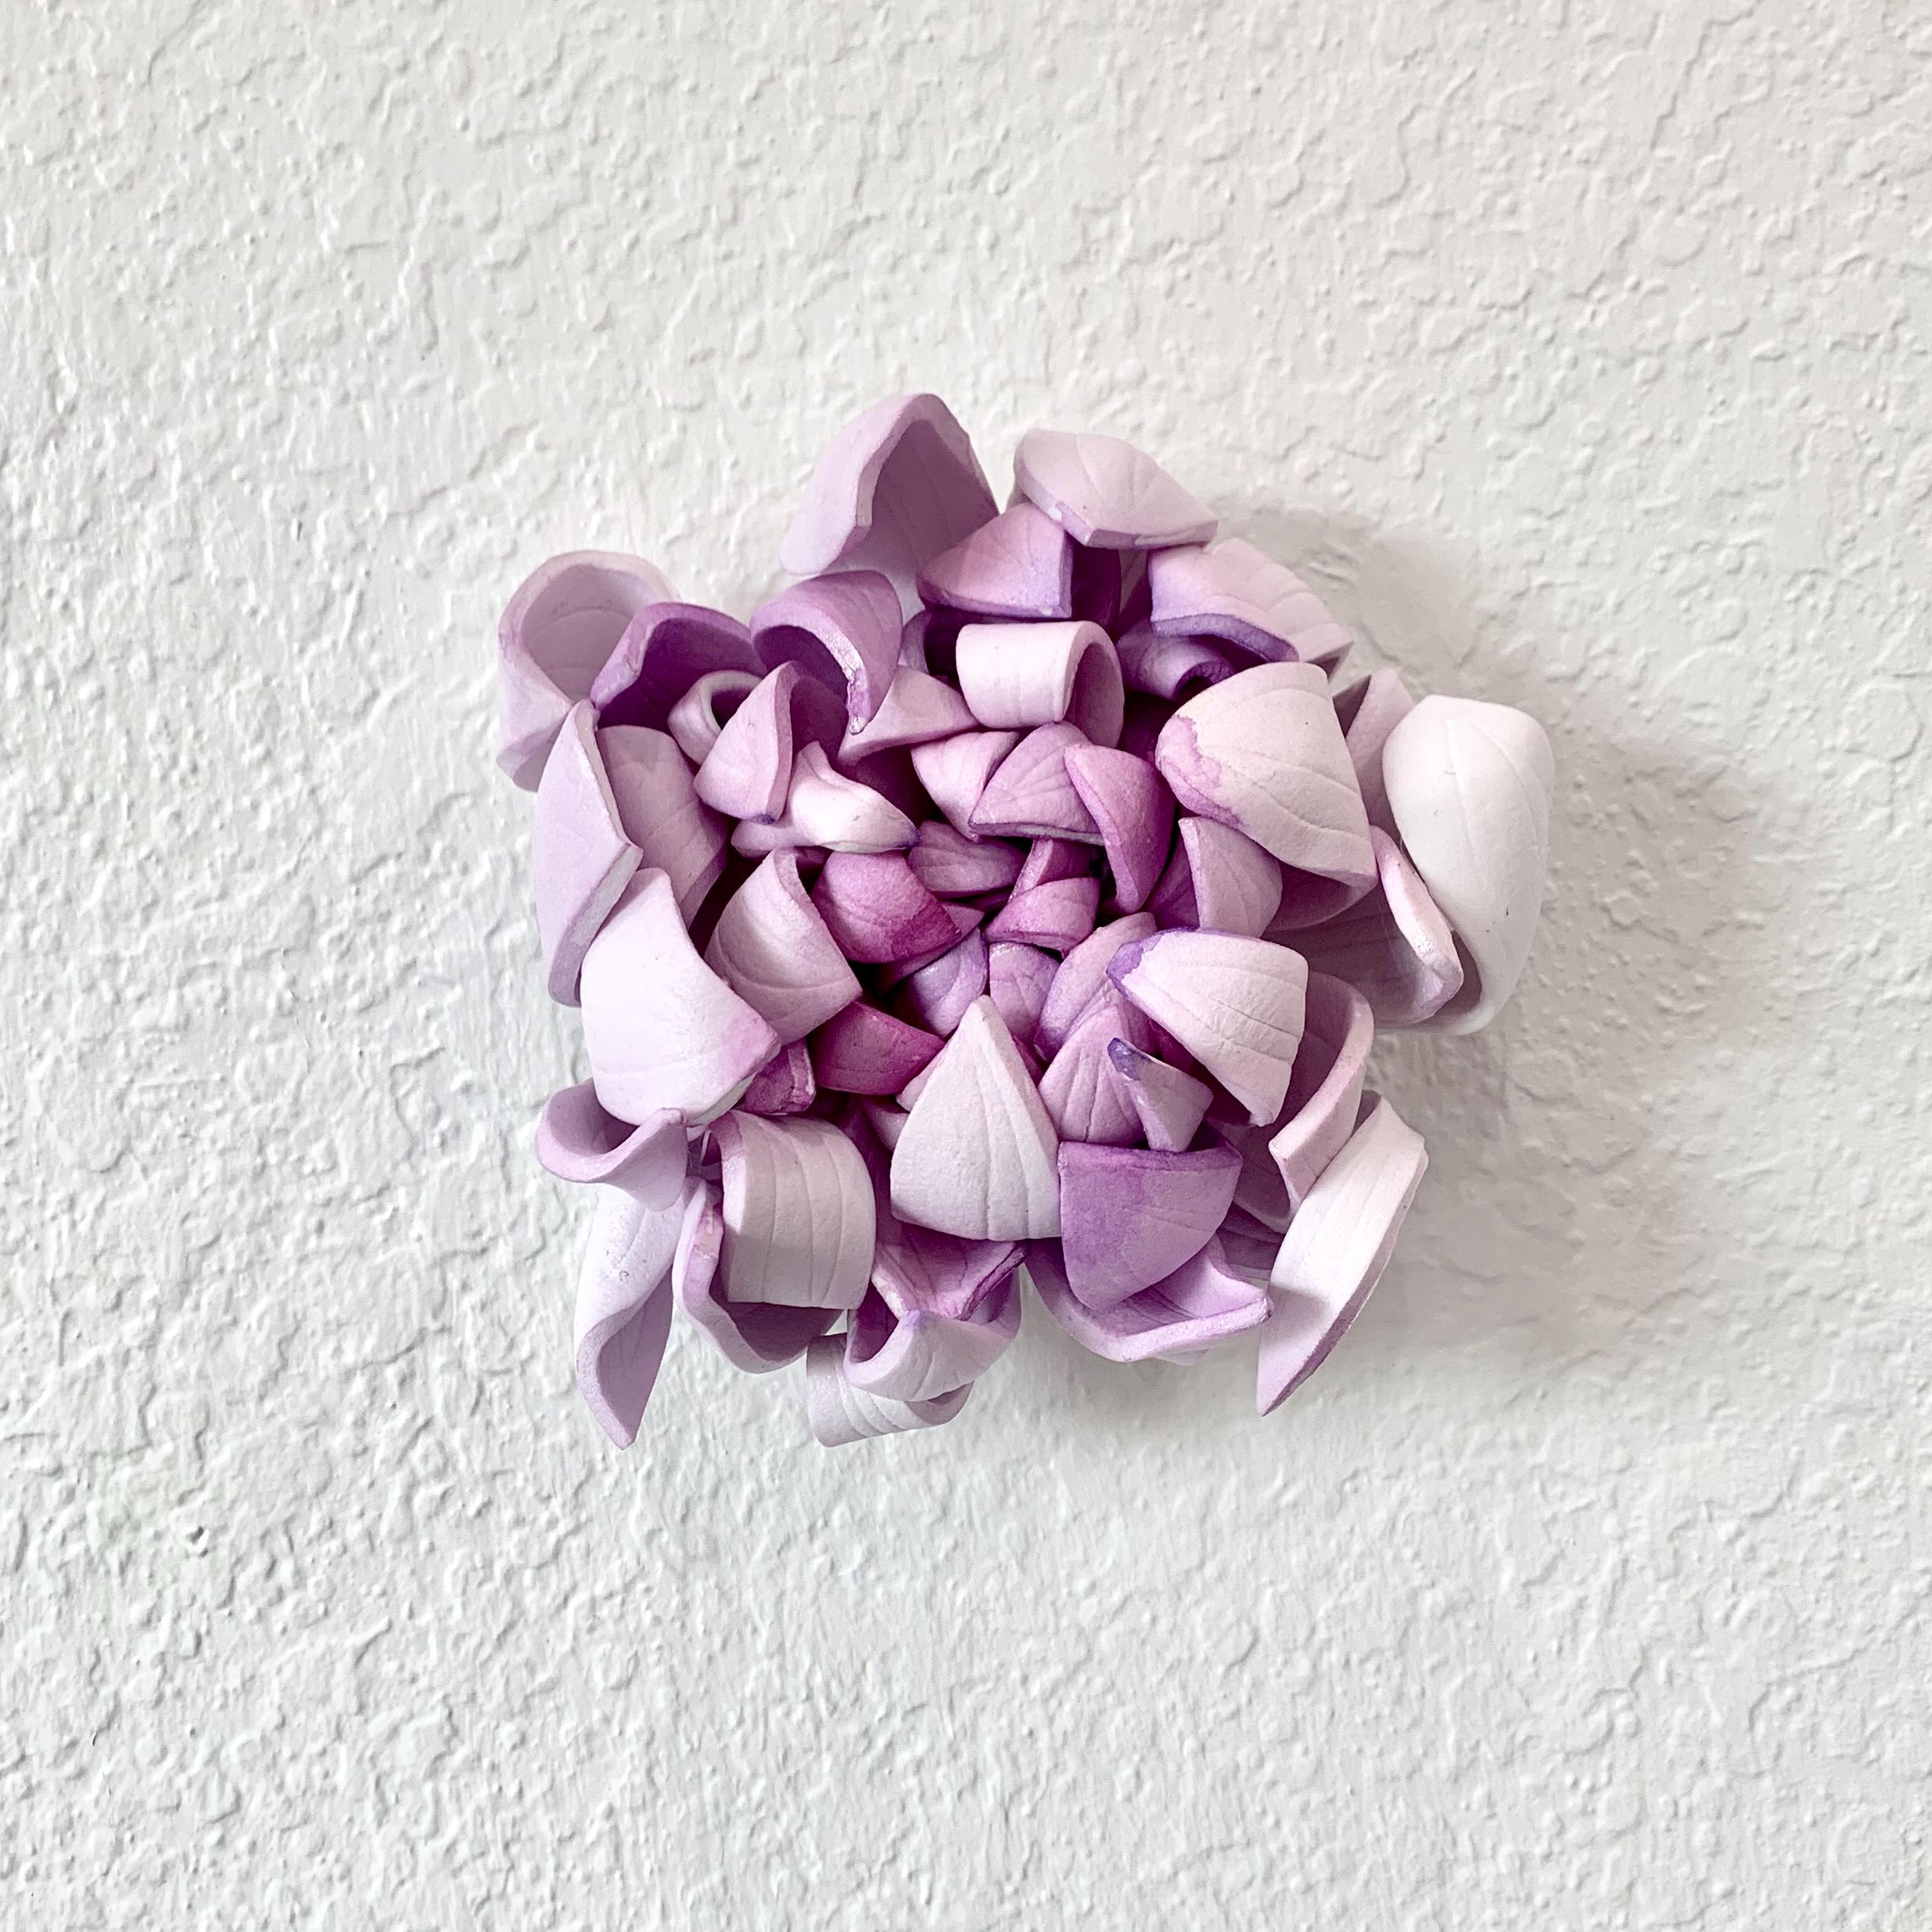 "Shimmer I  EVA foam, acrylic paint, 5"" diameter x 2.5"" depth  $240.00"